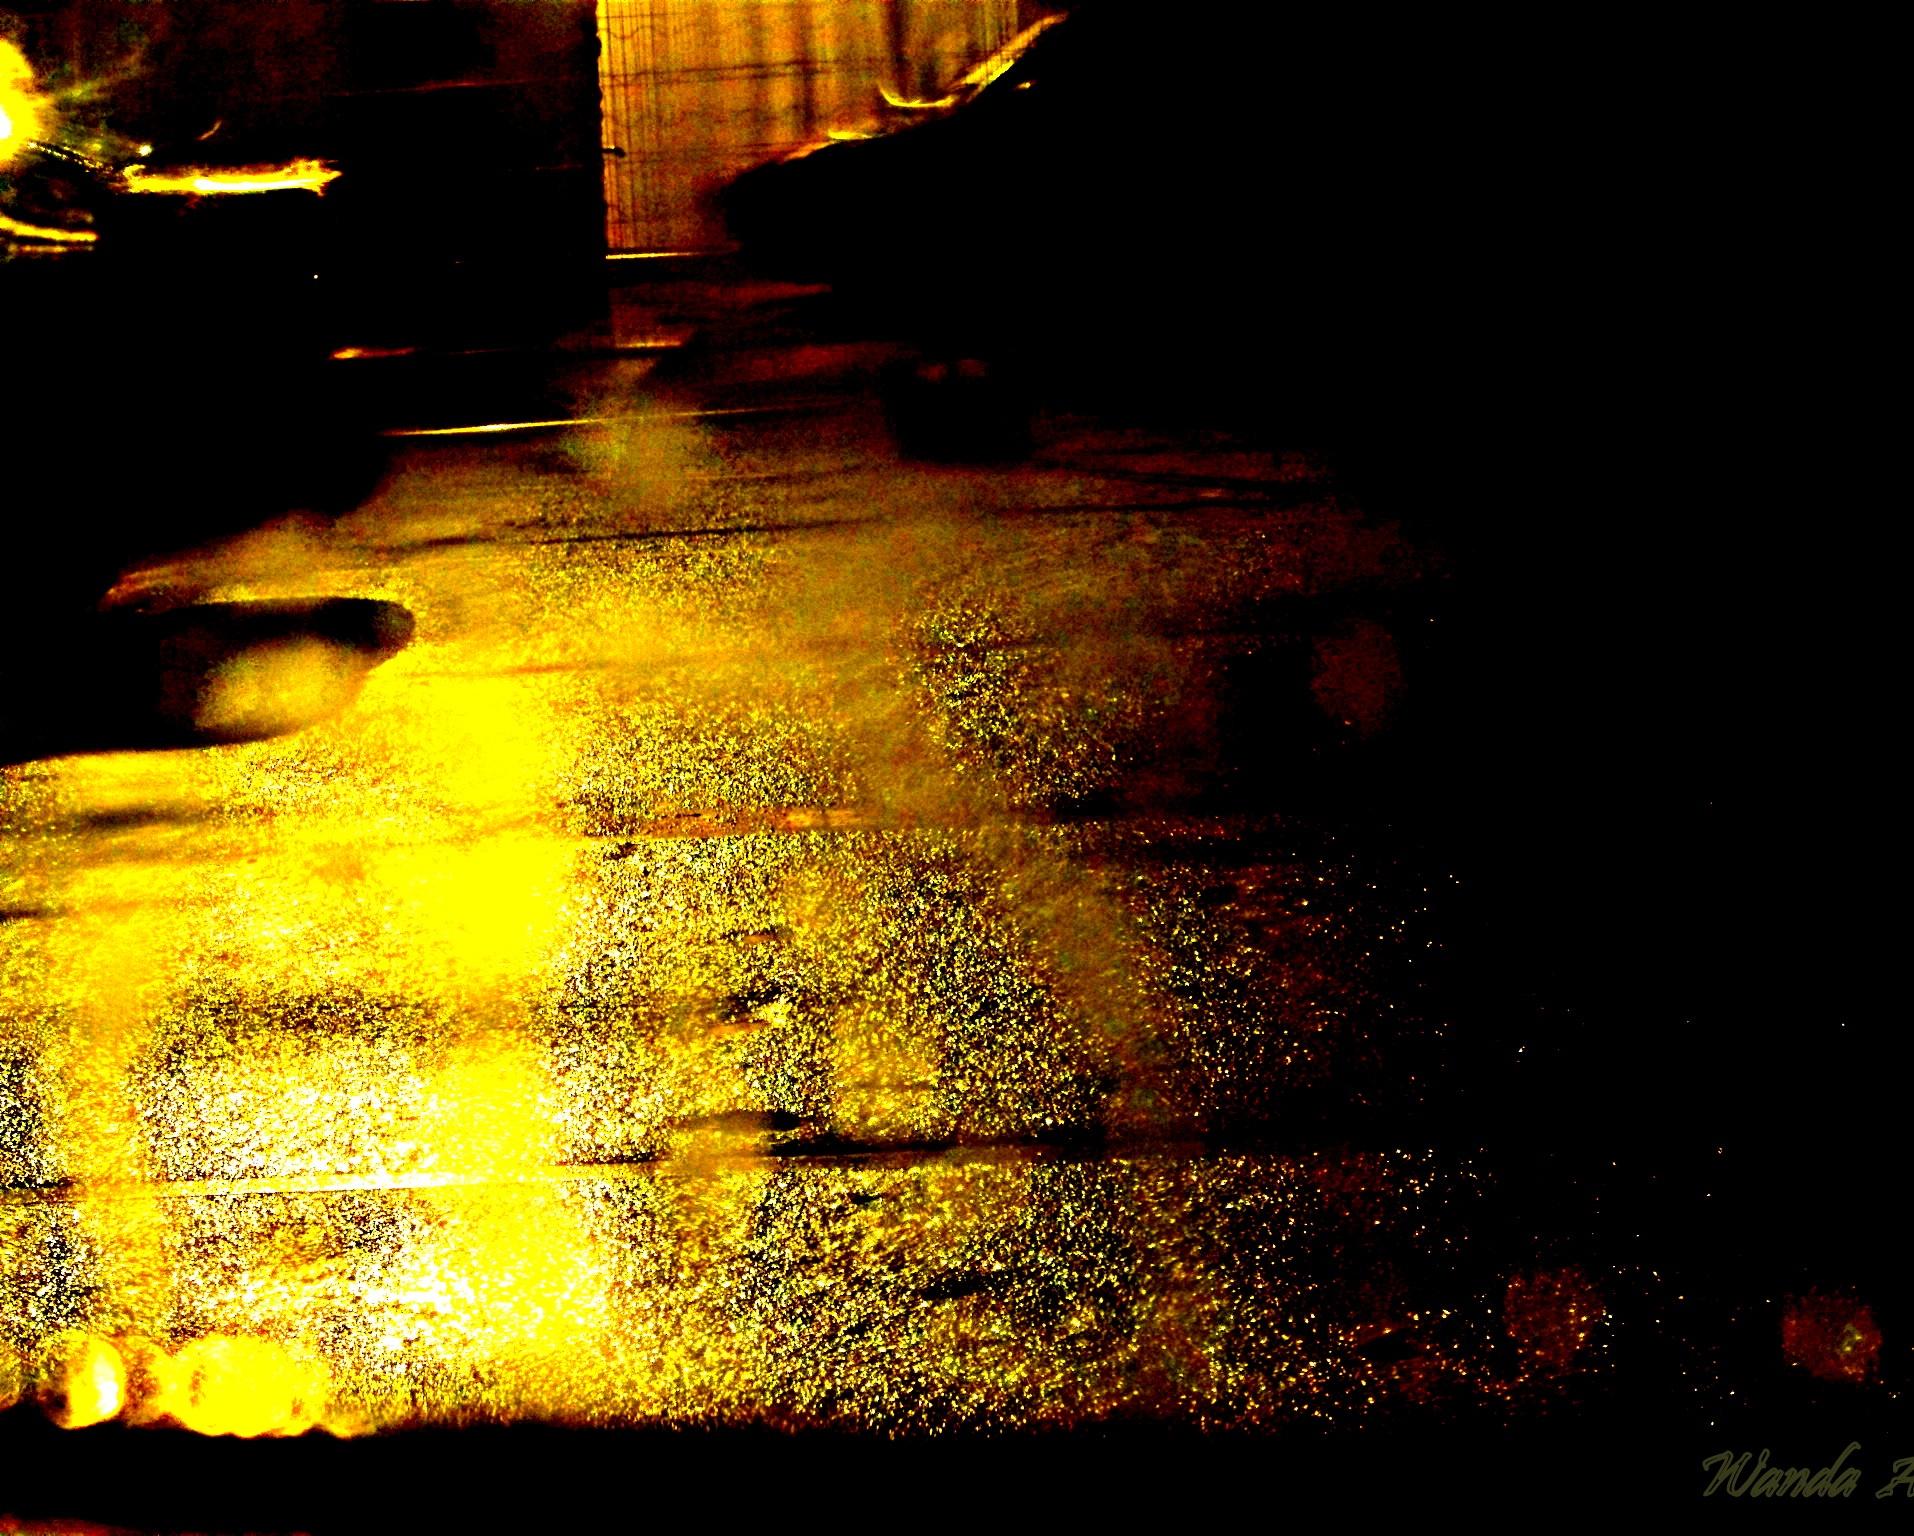 Night glow by Wandawonder